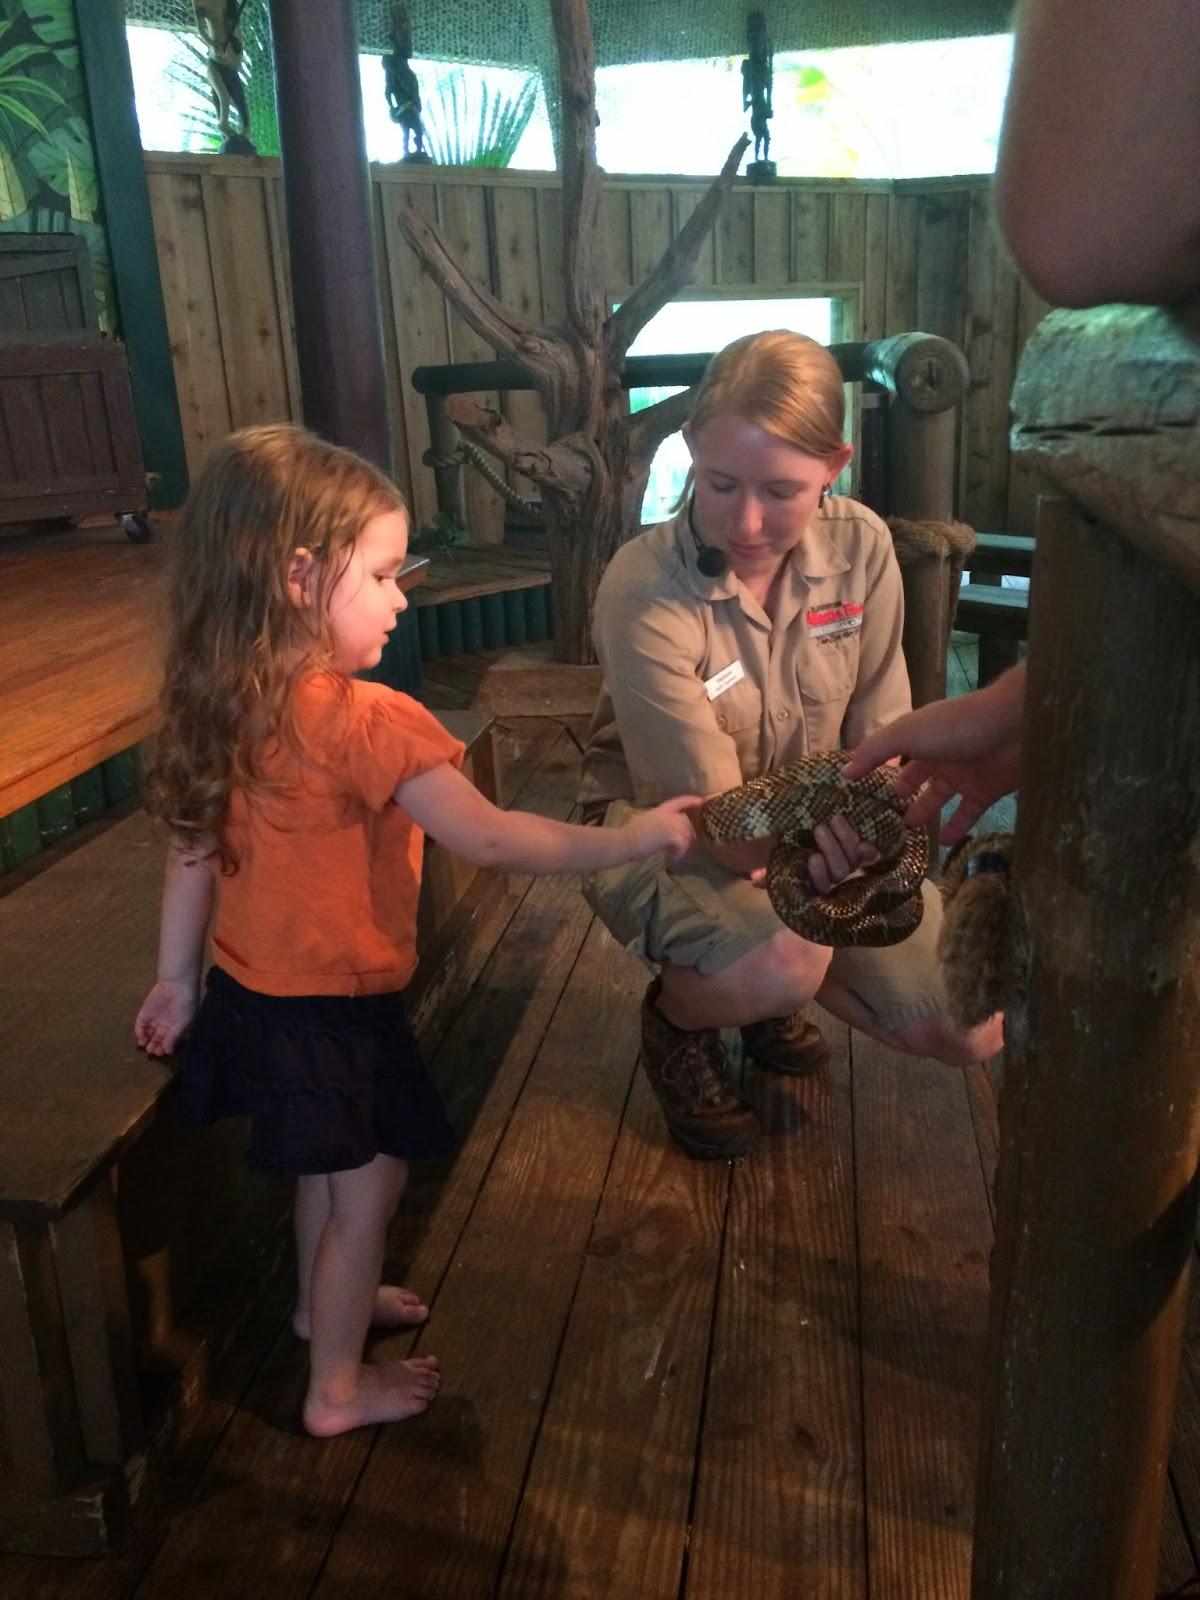 petting snake St. Augustine Alligator Farm #jaxblogger #flblogger #ivysvariety